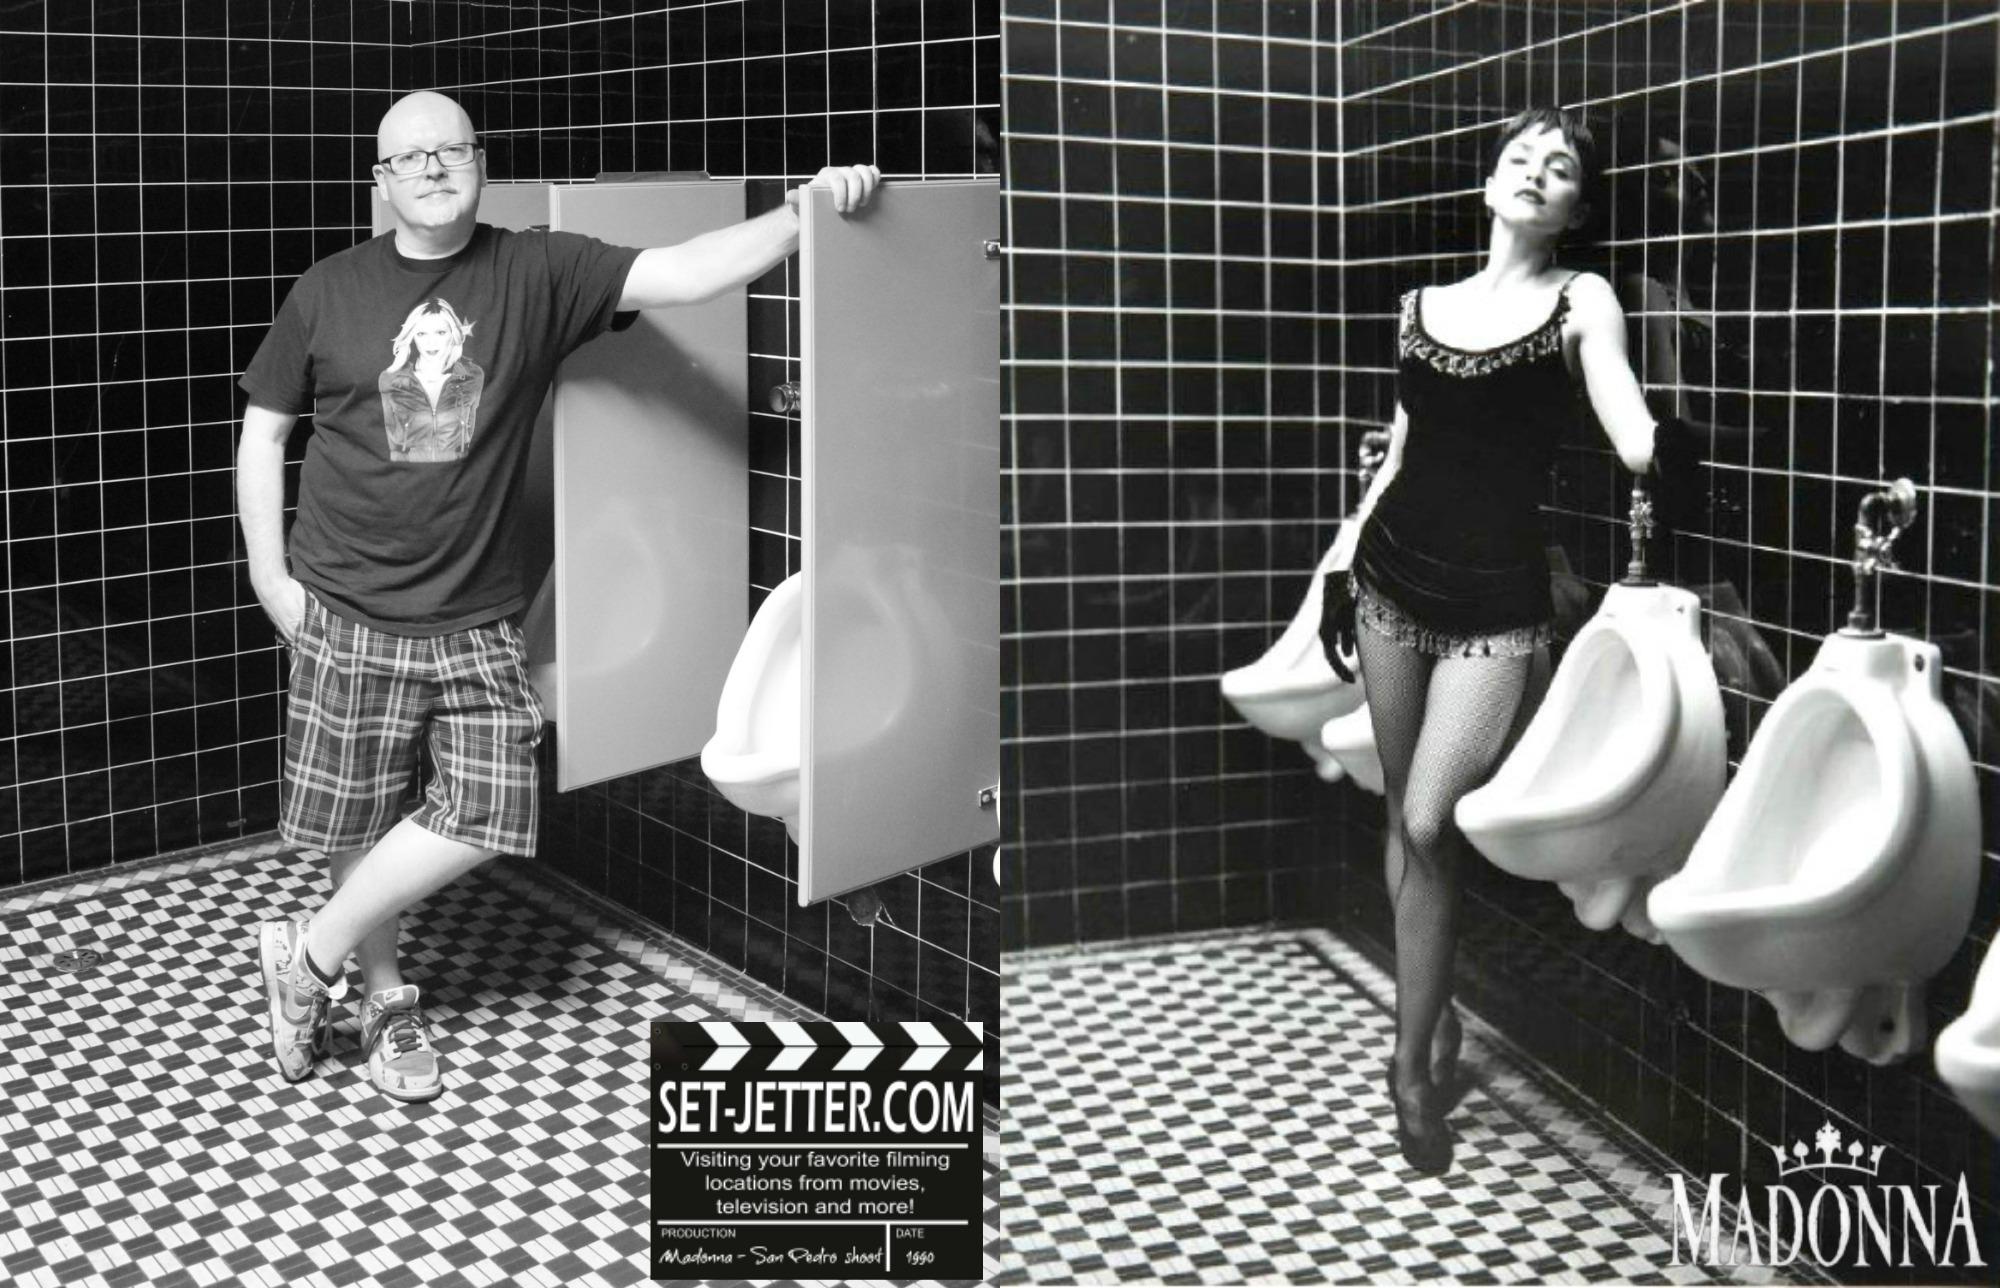 Madonna-HerbRitts-01R.jpg